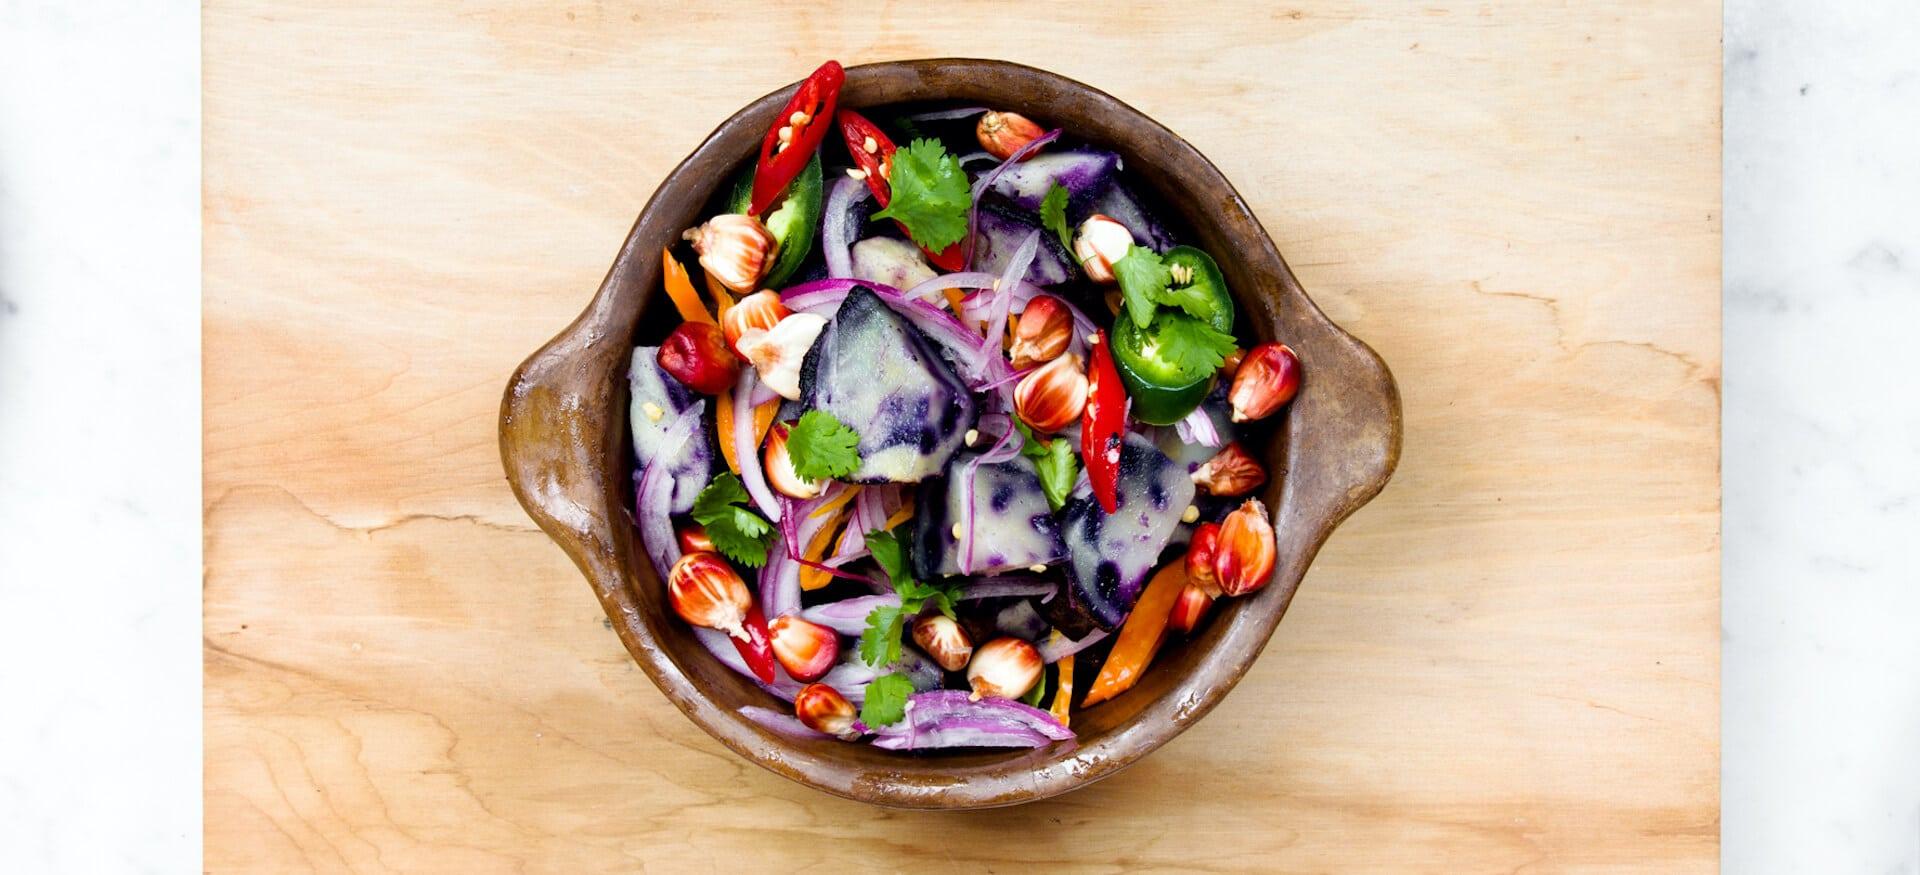 Gesunder Ernährung lernen – Salat Bowl